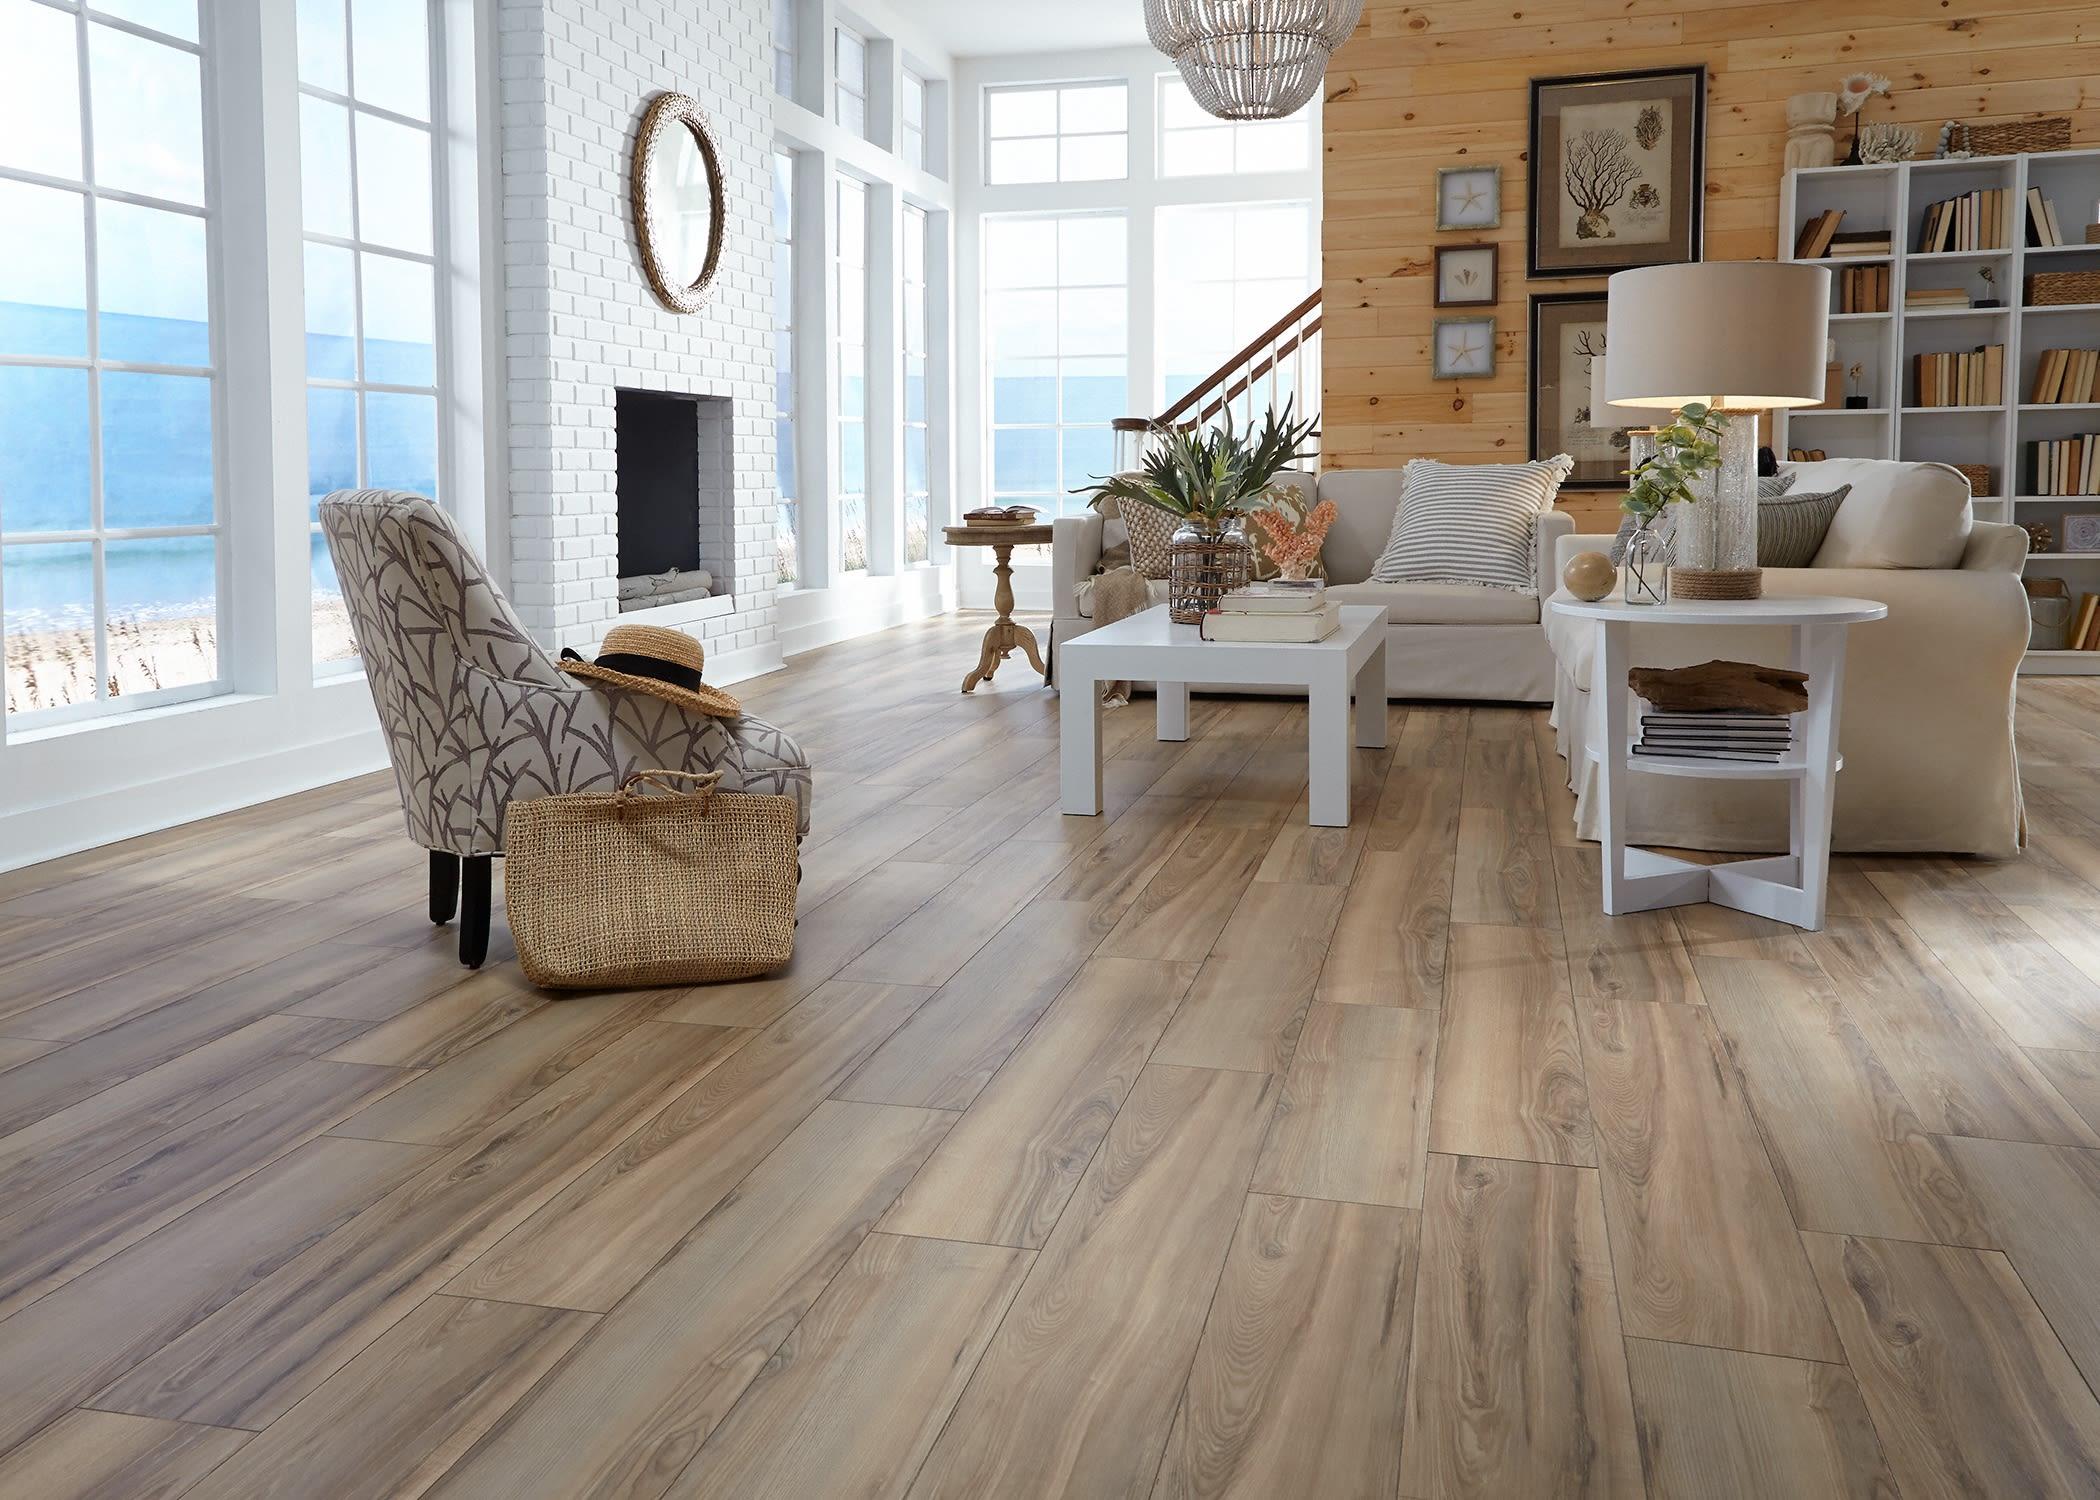 Laminate Flooring Wood Floors, Main Gate Laminate Flooring